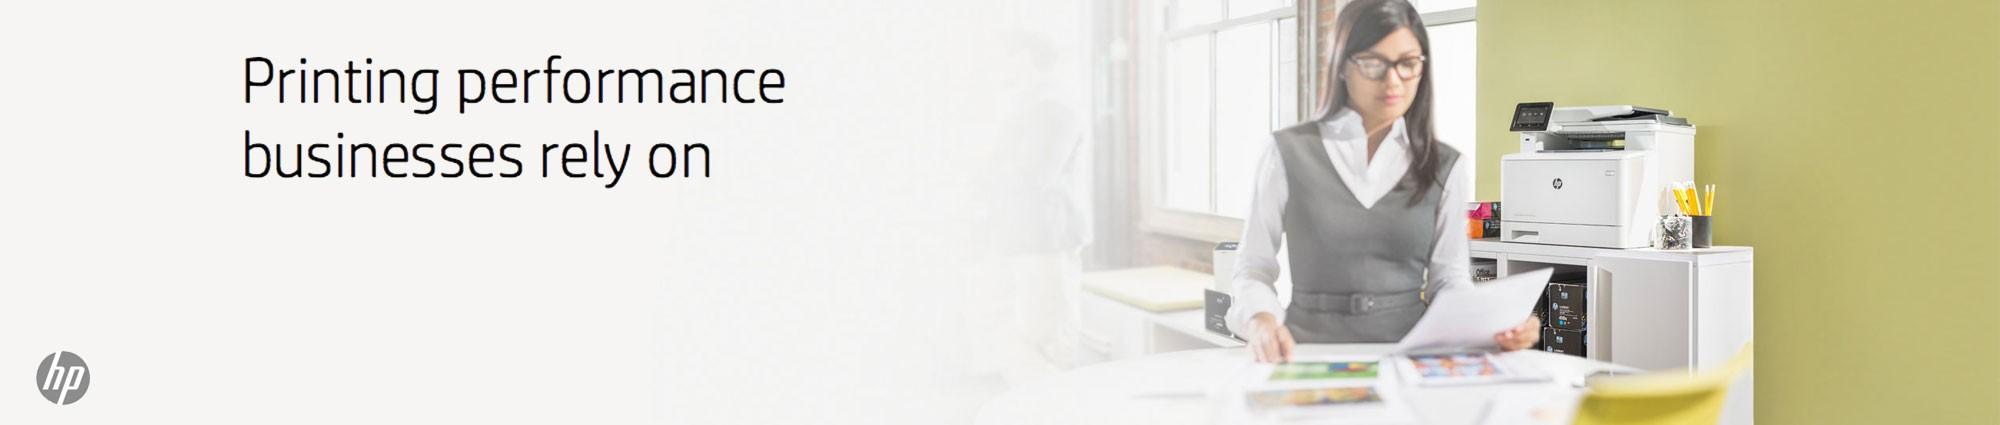 https://dpyxfisjd0mft.cloudfront.net/lab9-2/B2B/Sliders_B2B/Office%20Printing/Banner-OfficePrinting-HP.jpg?1455203555&w=2000&h=425